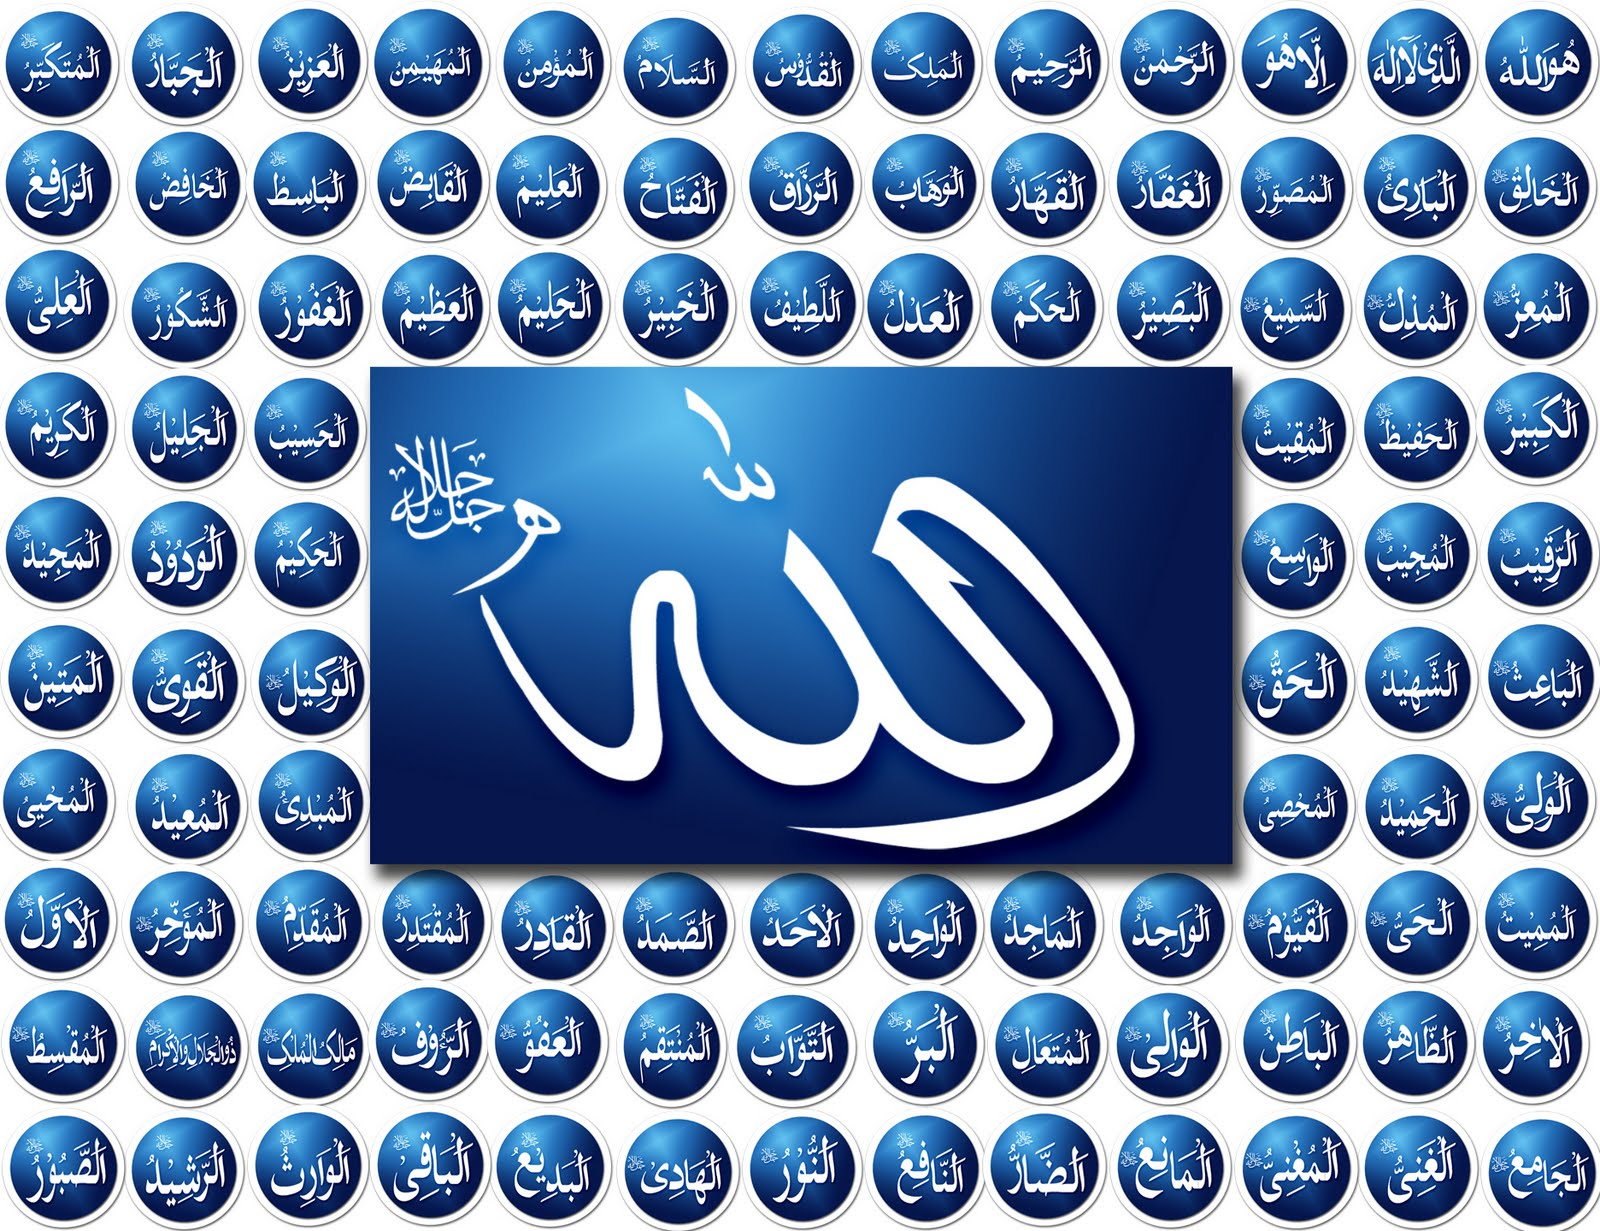 http://1.bp.blogspot.com/-qciorRSaMjY/Ti-gbLRzBoI/AAAAAAAAAB4/eELSO3N-4Ek/s1600/99-names-of-Allah-on-one-wallpaper.jpg